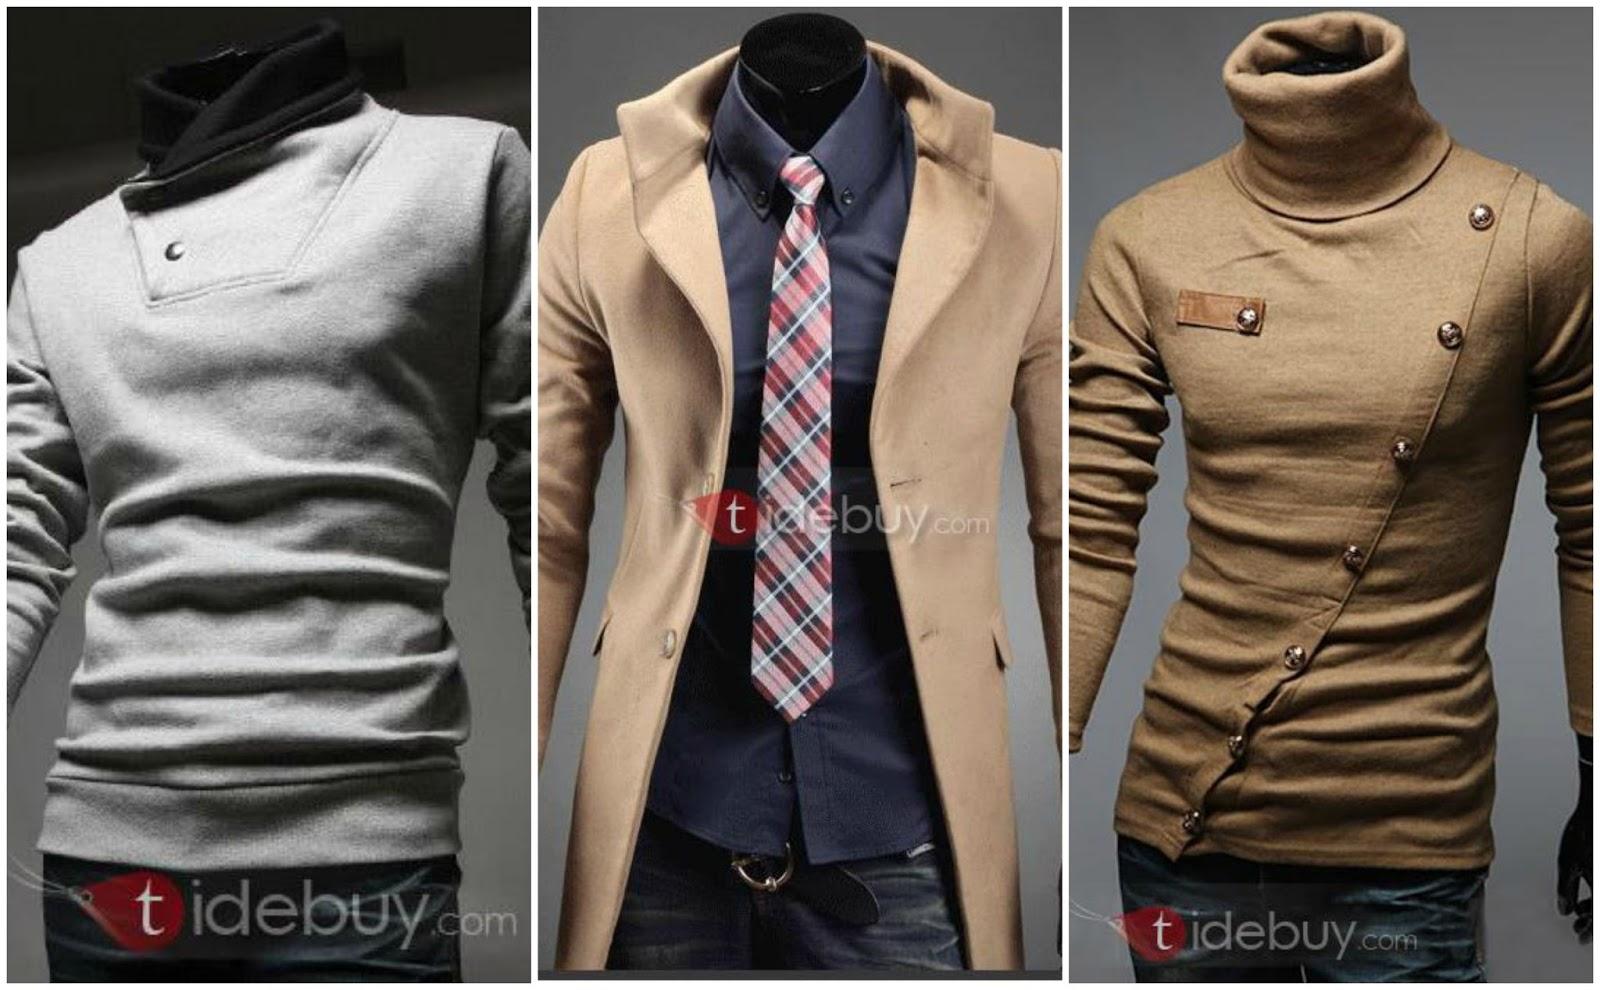 Stylish Men's clothing from Tidebuy.com